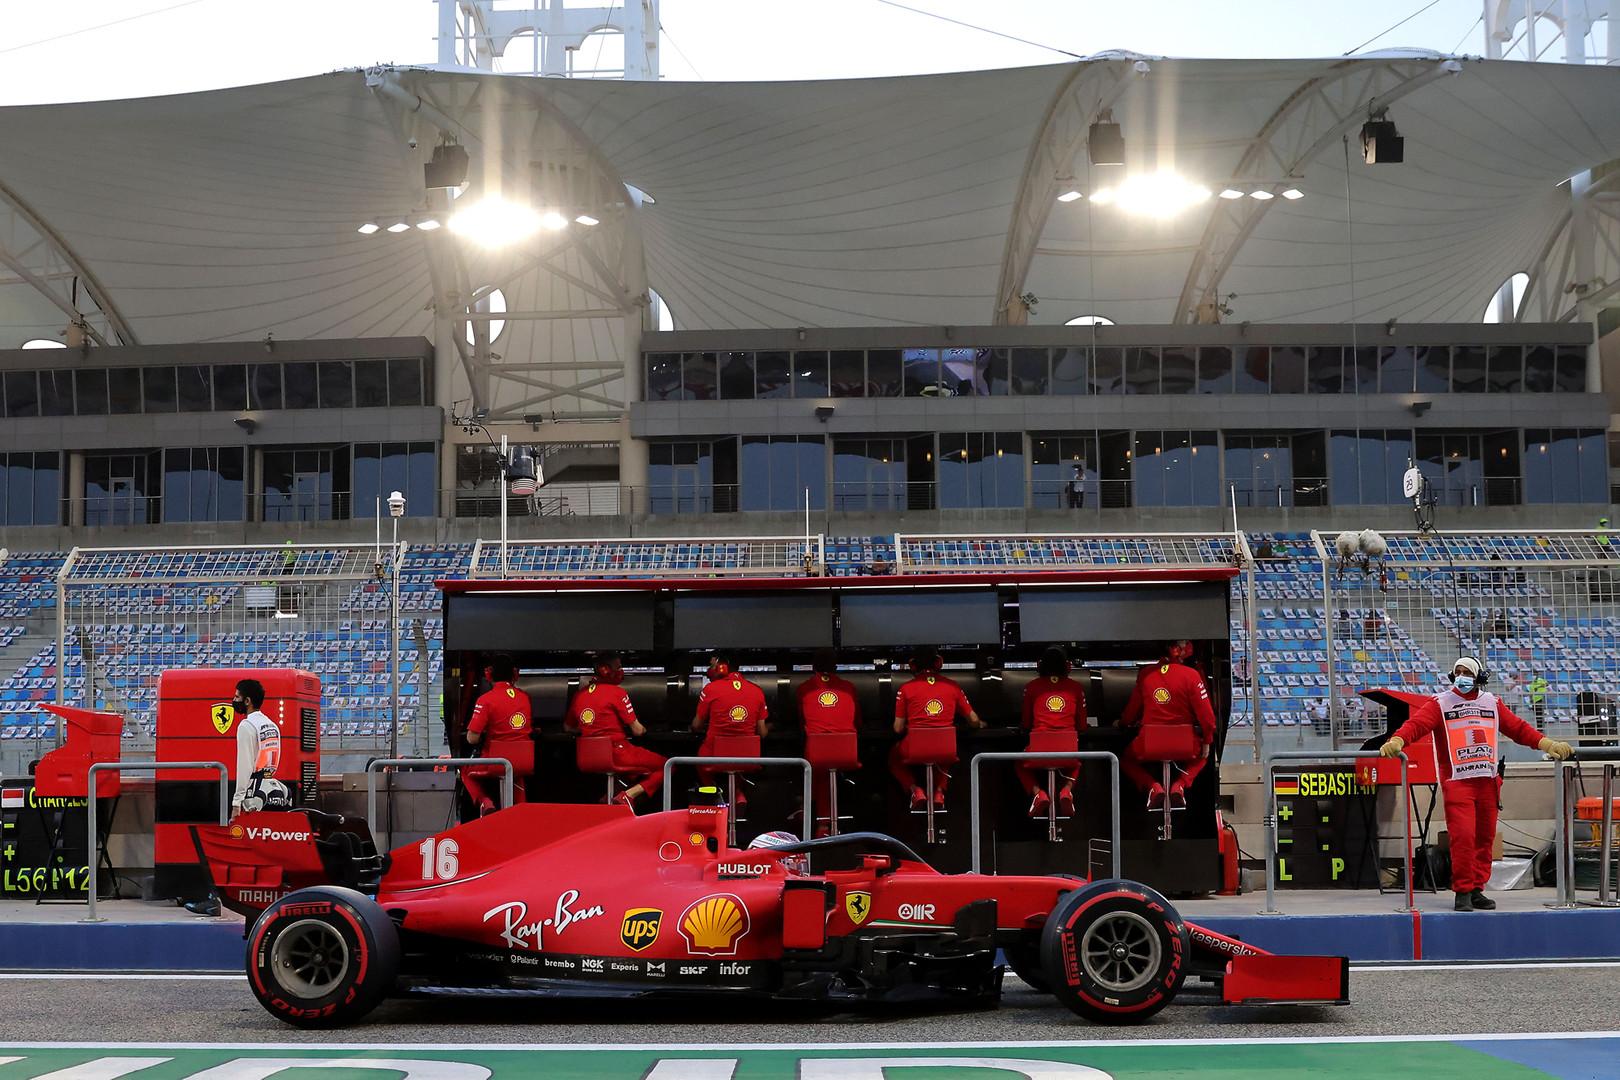 Ferrari Leclerc Developing Into Clear Leader Like Schumacher